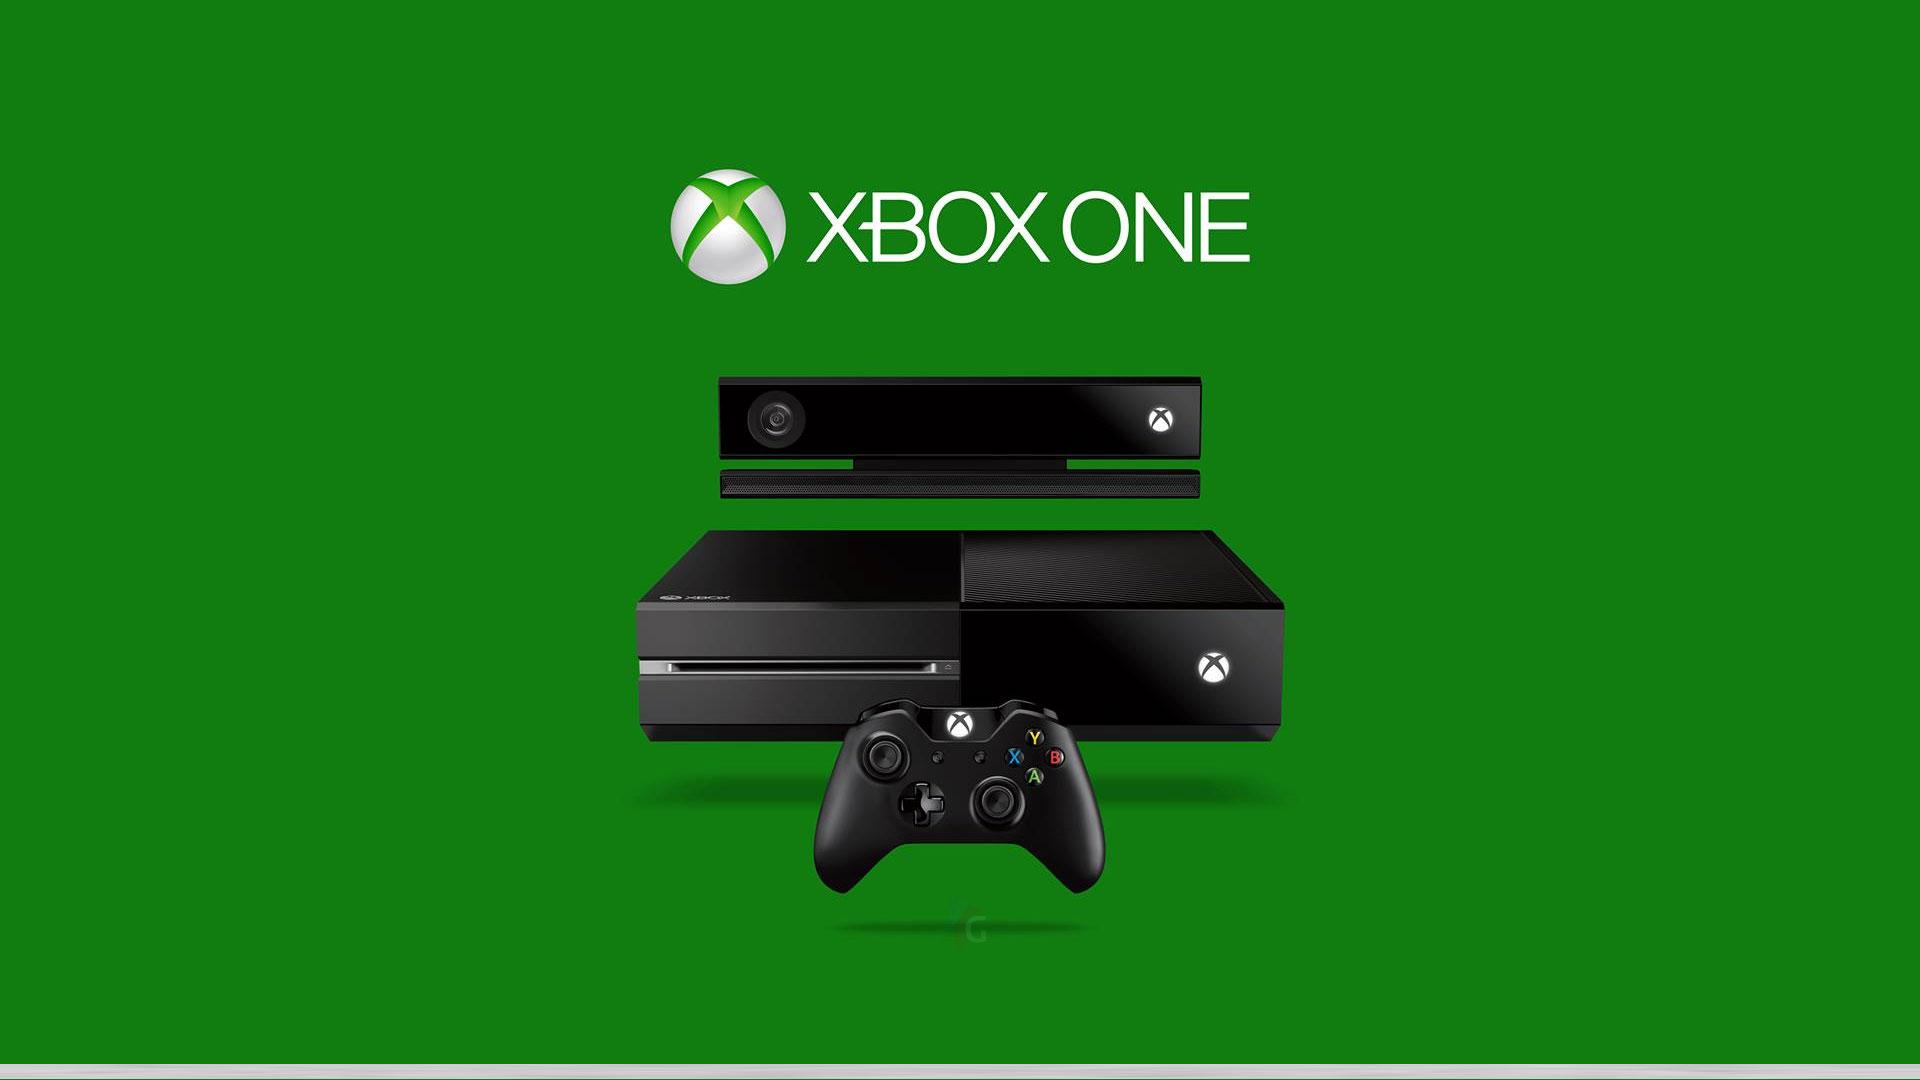 Xbox One 1080p Wallpaper Xbox One 720p Wallpaper 1920x1080